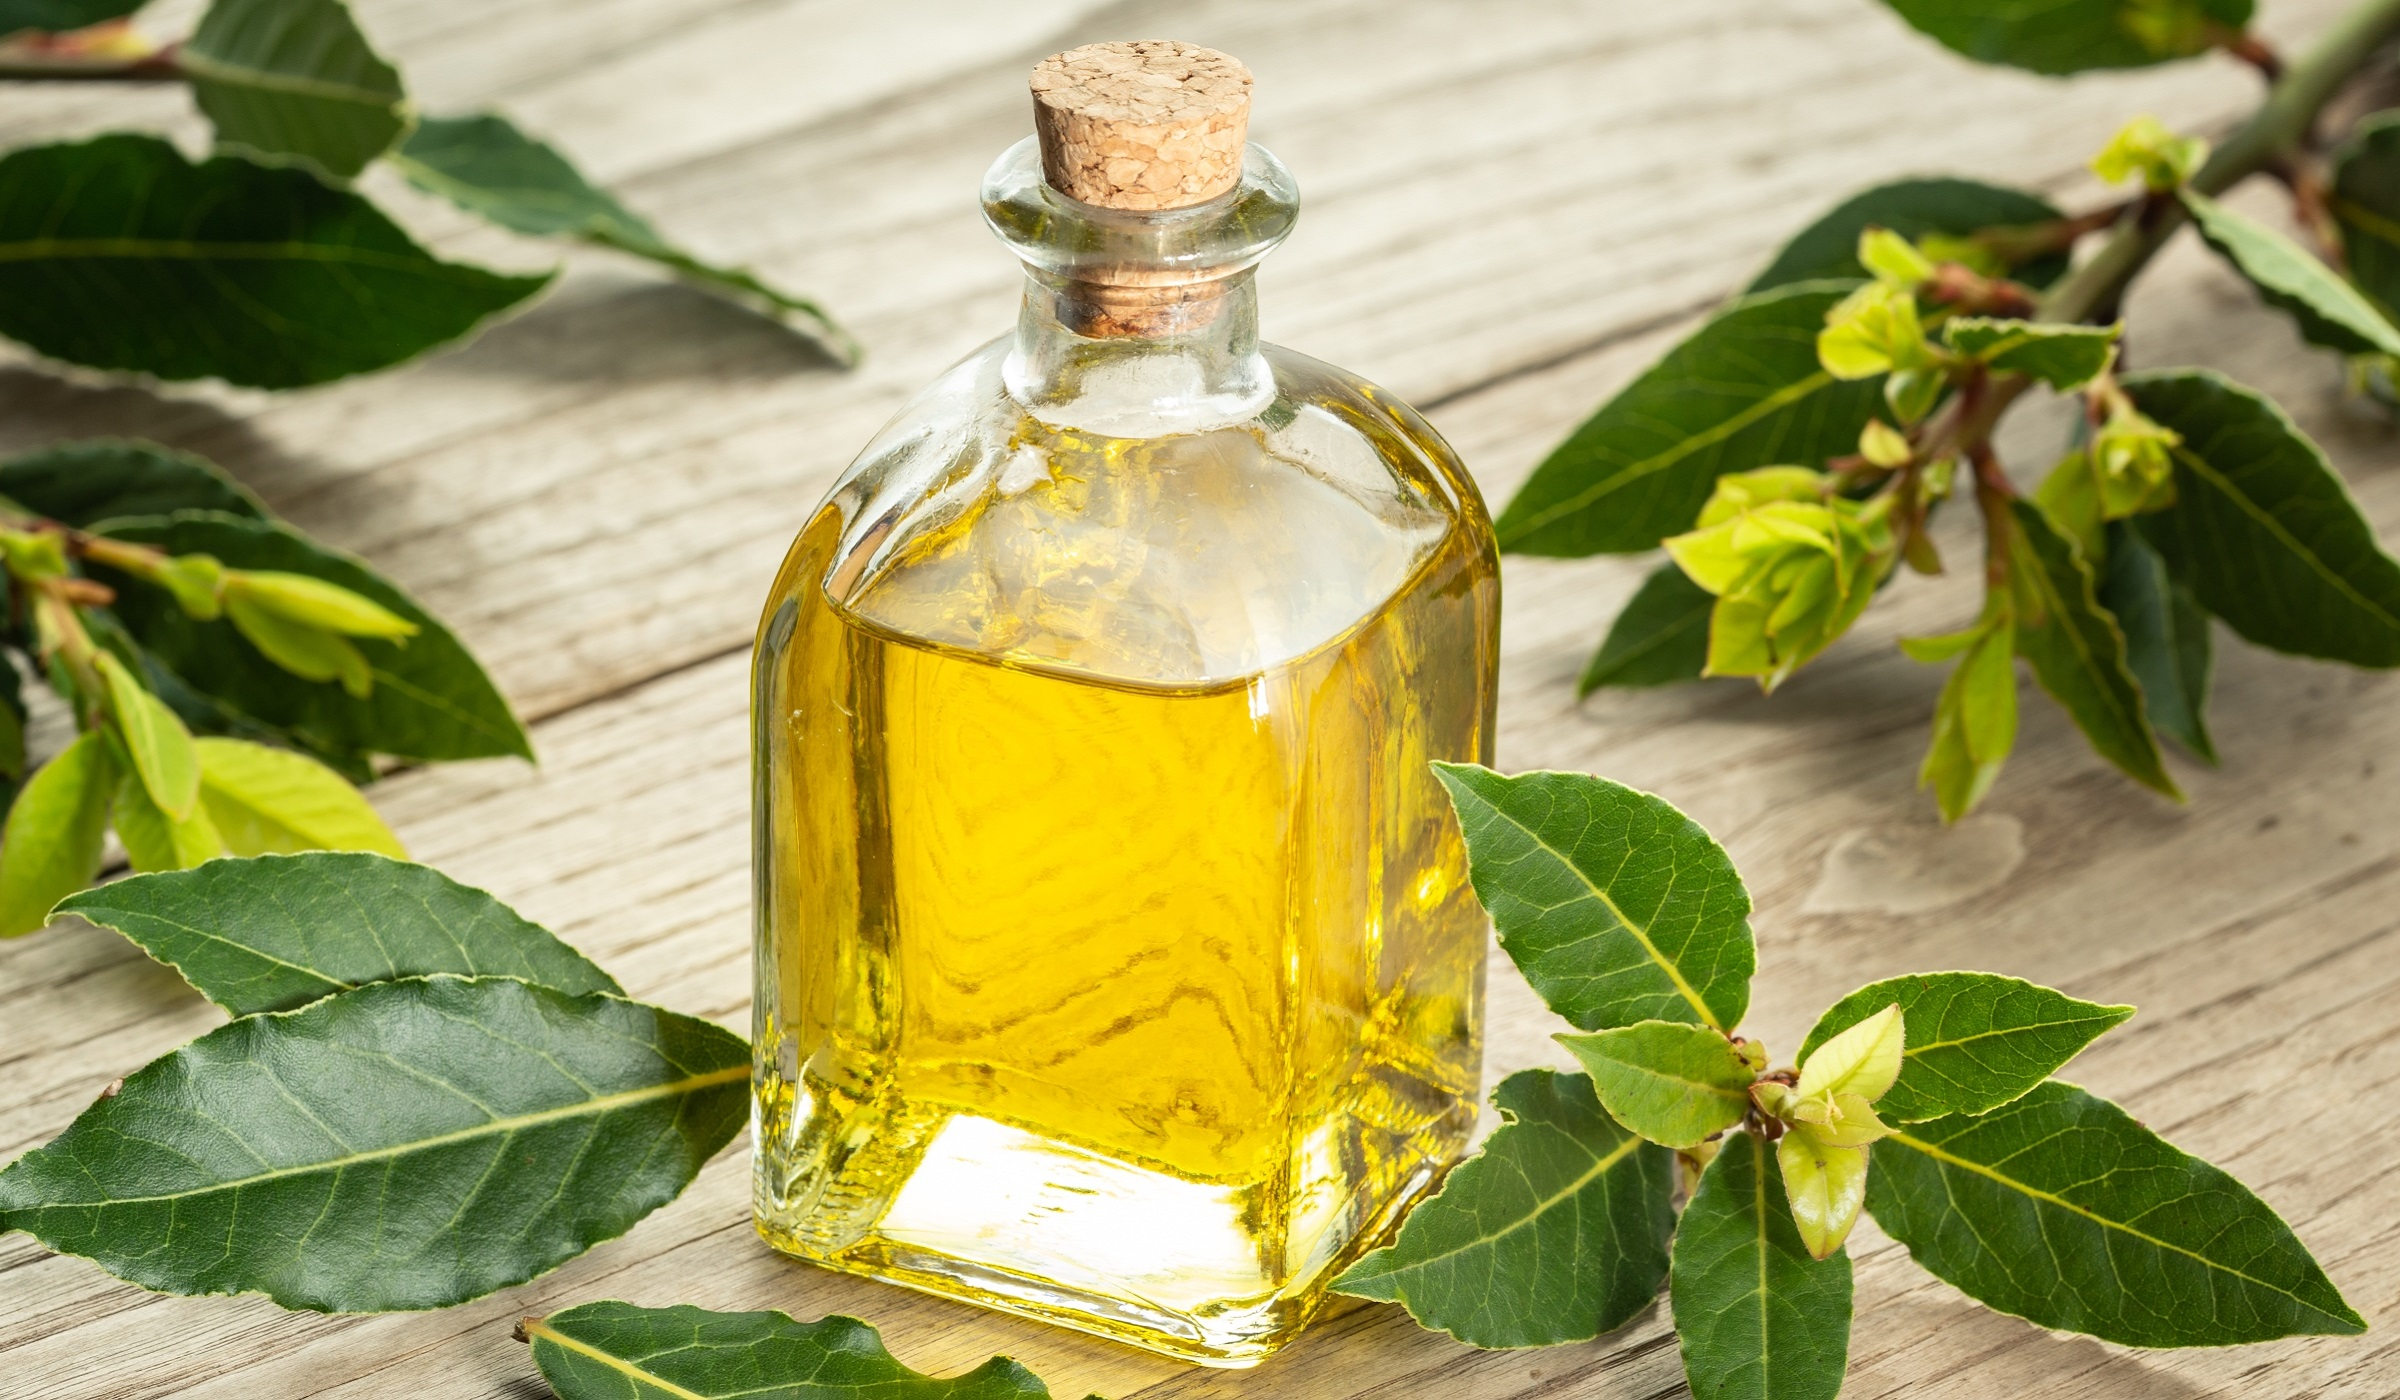 Monovarietal extra virgin olive oil